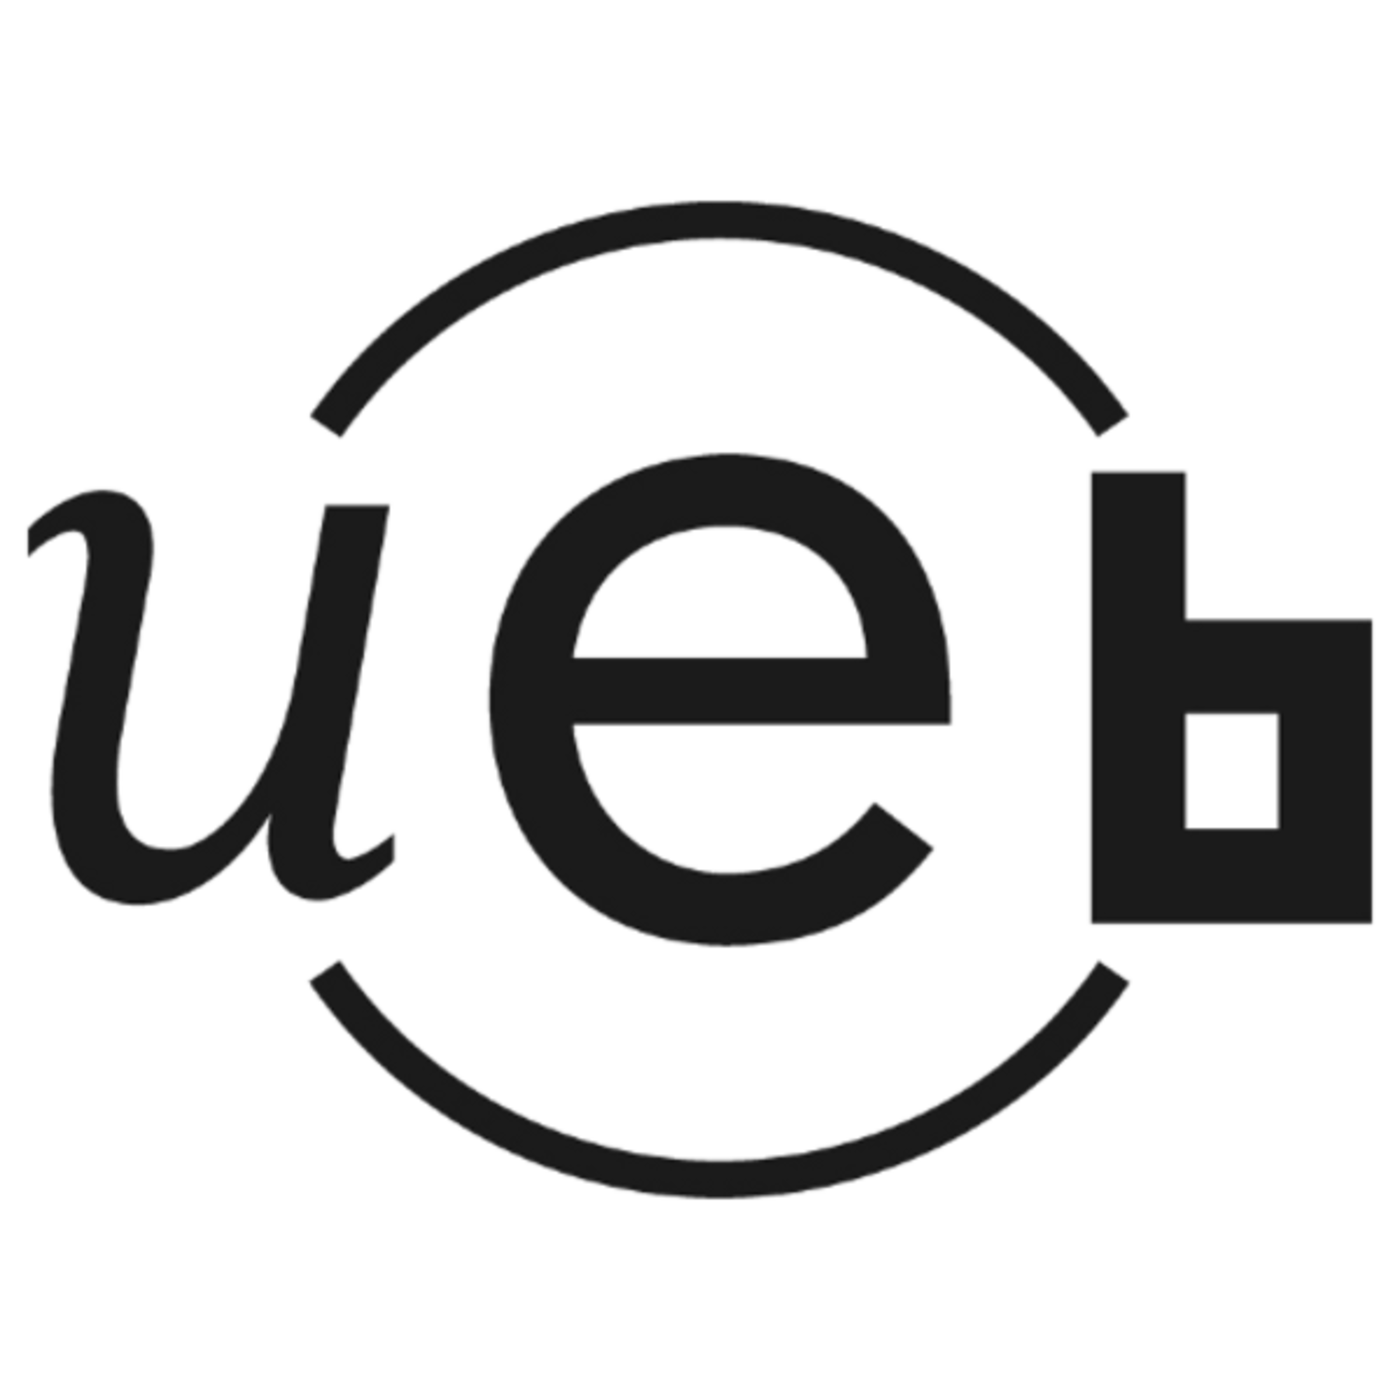 WIkiradio UEB Université Européenne de Bretagne